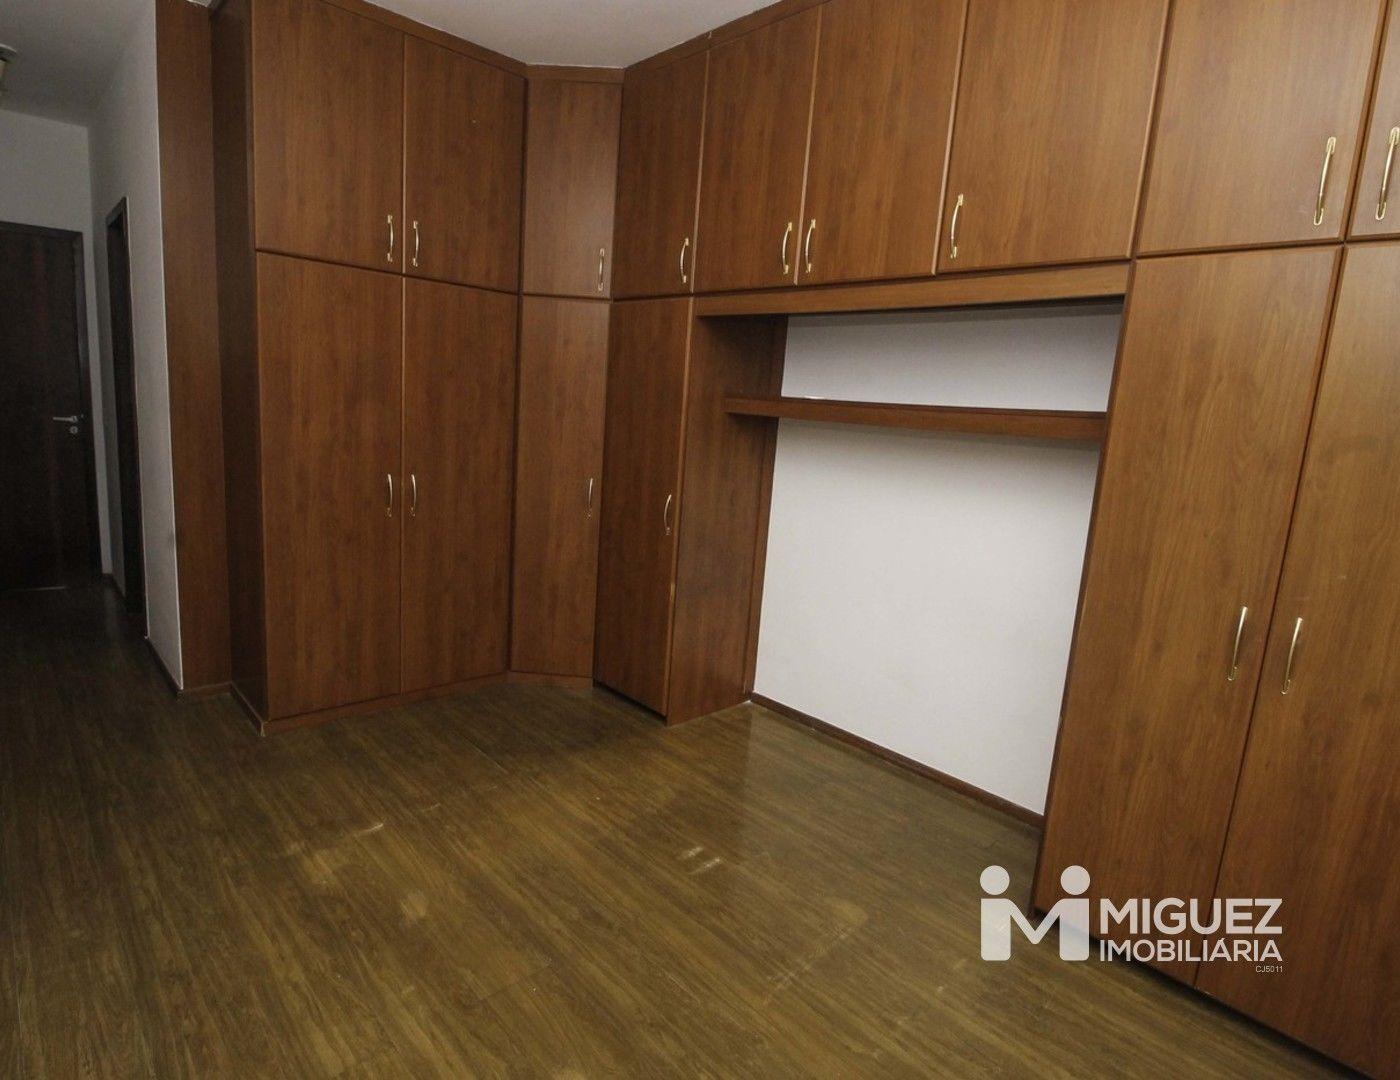 Apartamento, aluguel, Rua dos Araujos - Tijuca , Rio de janeiro